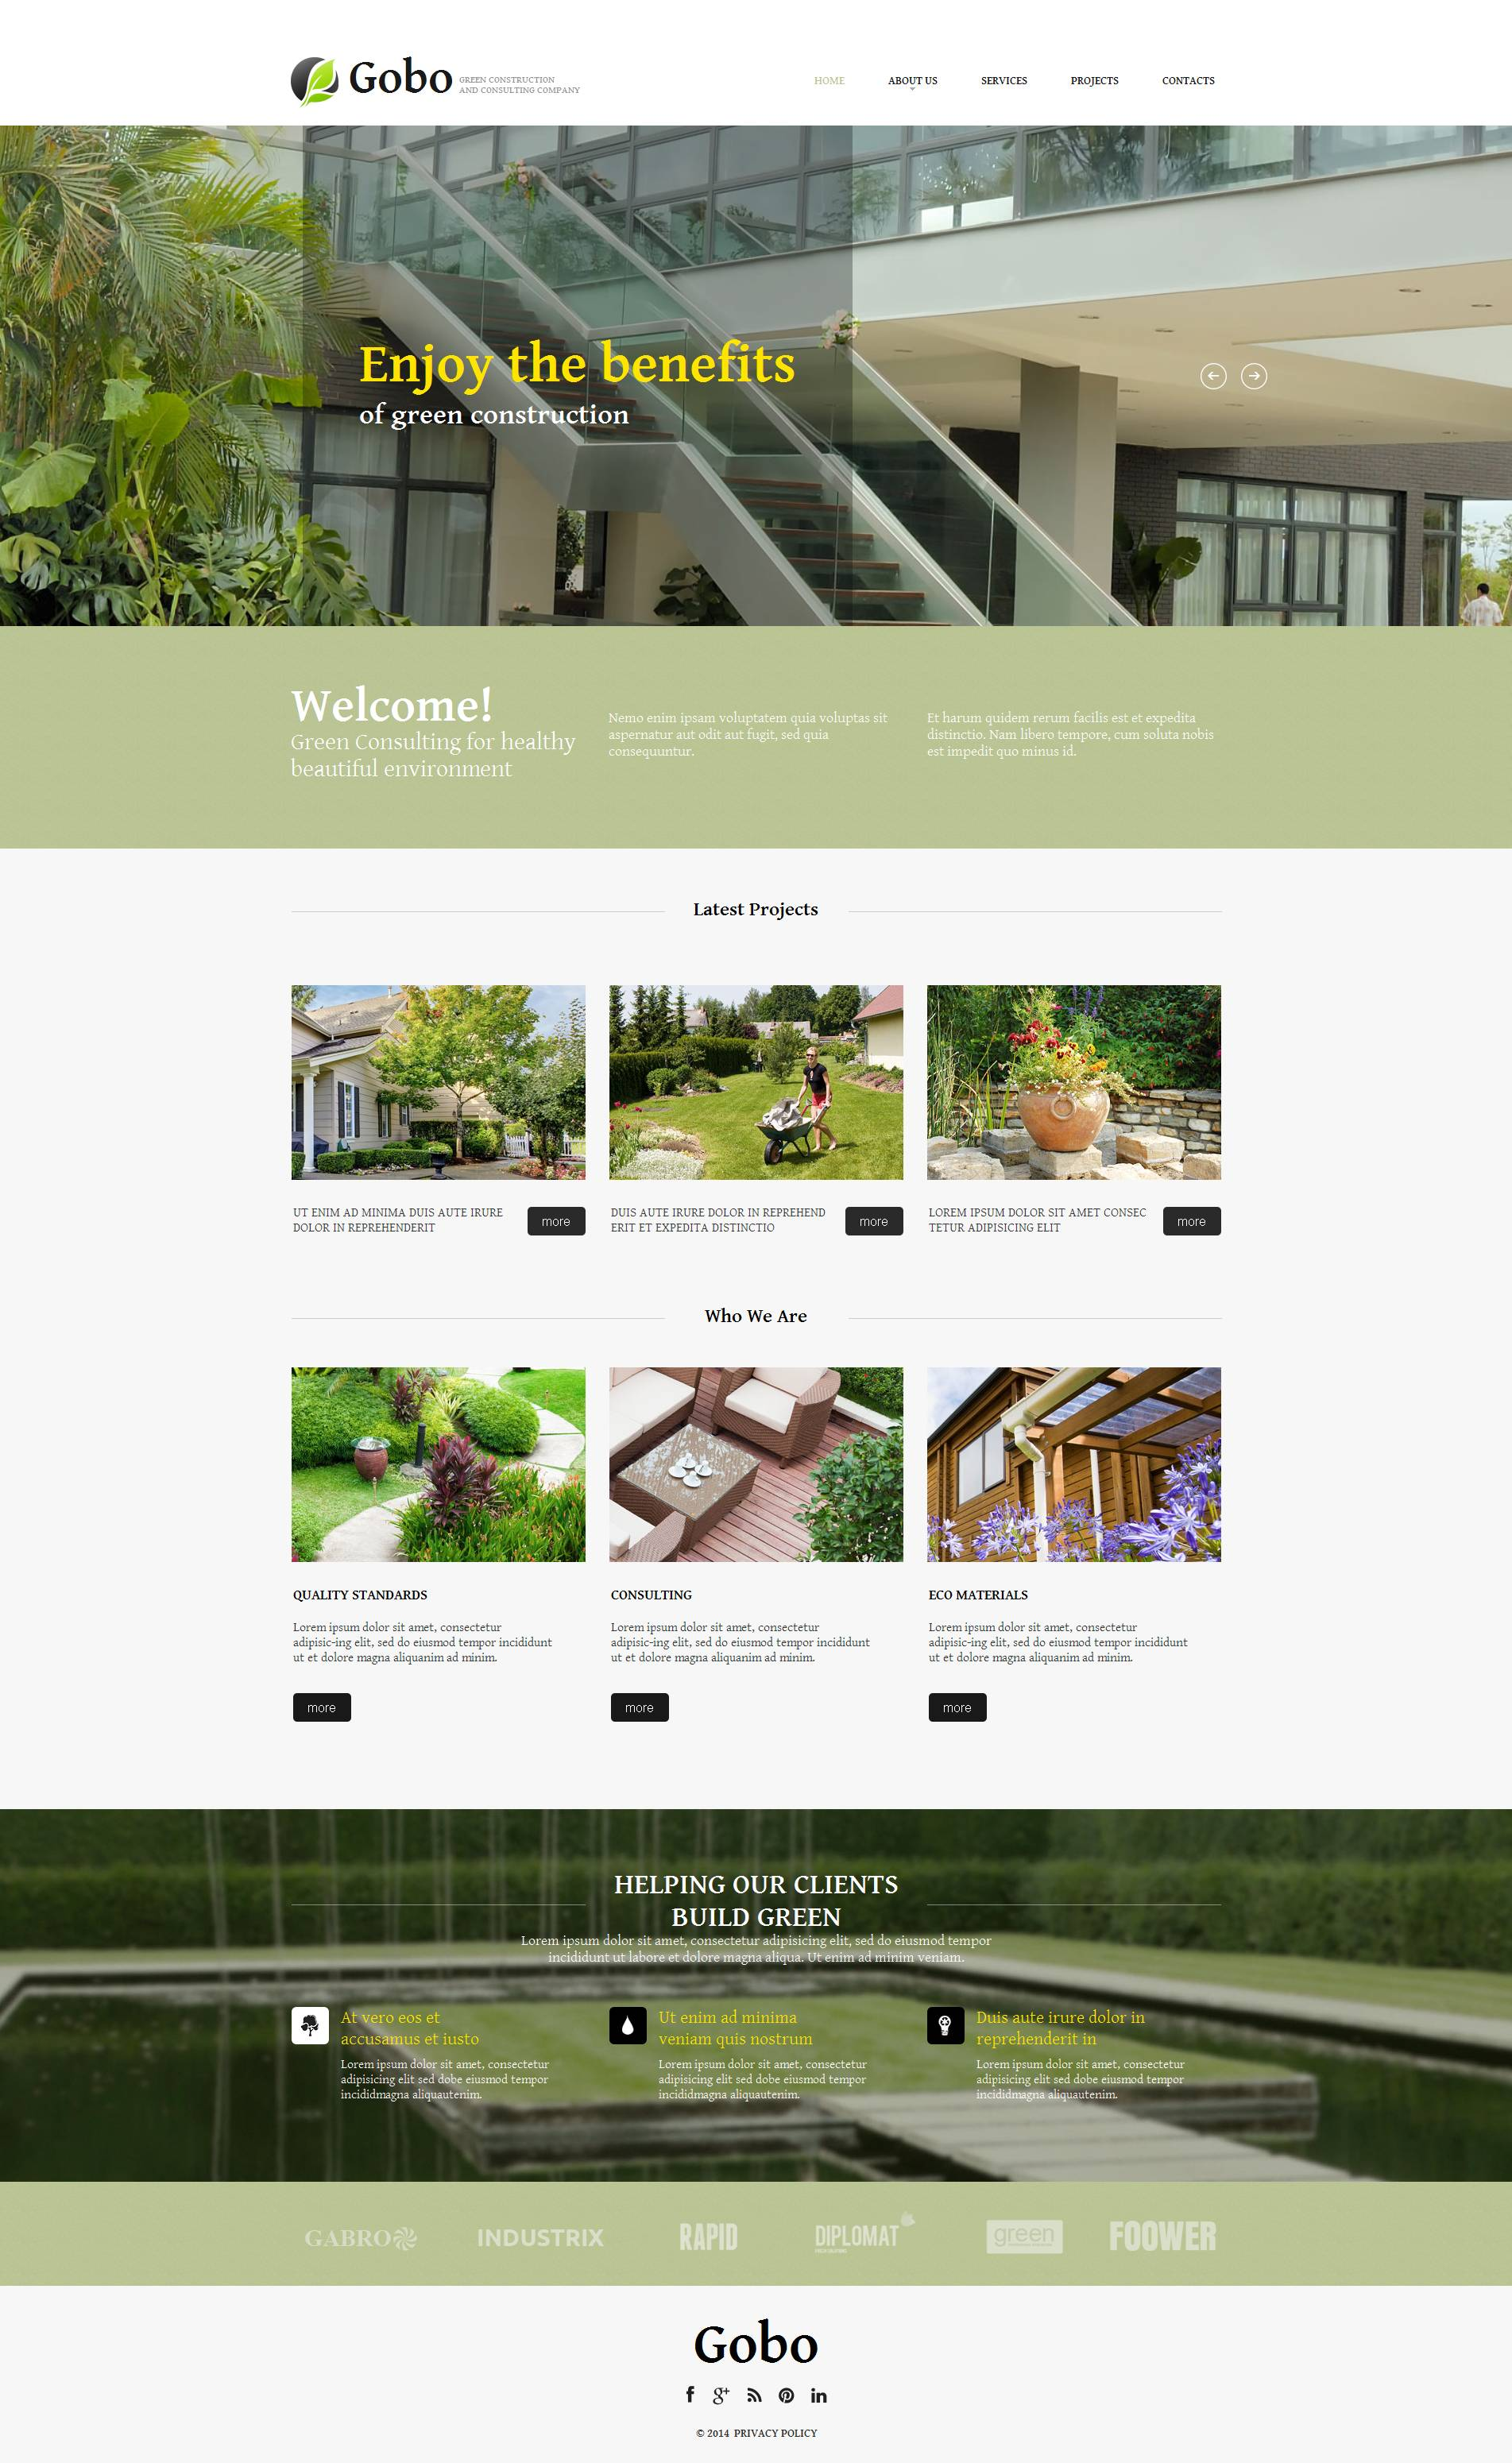 Szablon Moto CMS HTML #52219 na temat: architektura krajobrazu